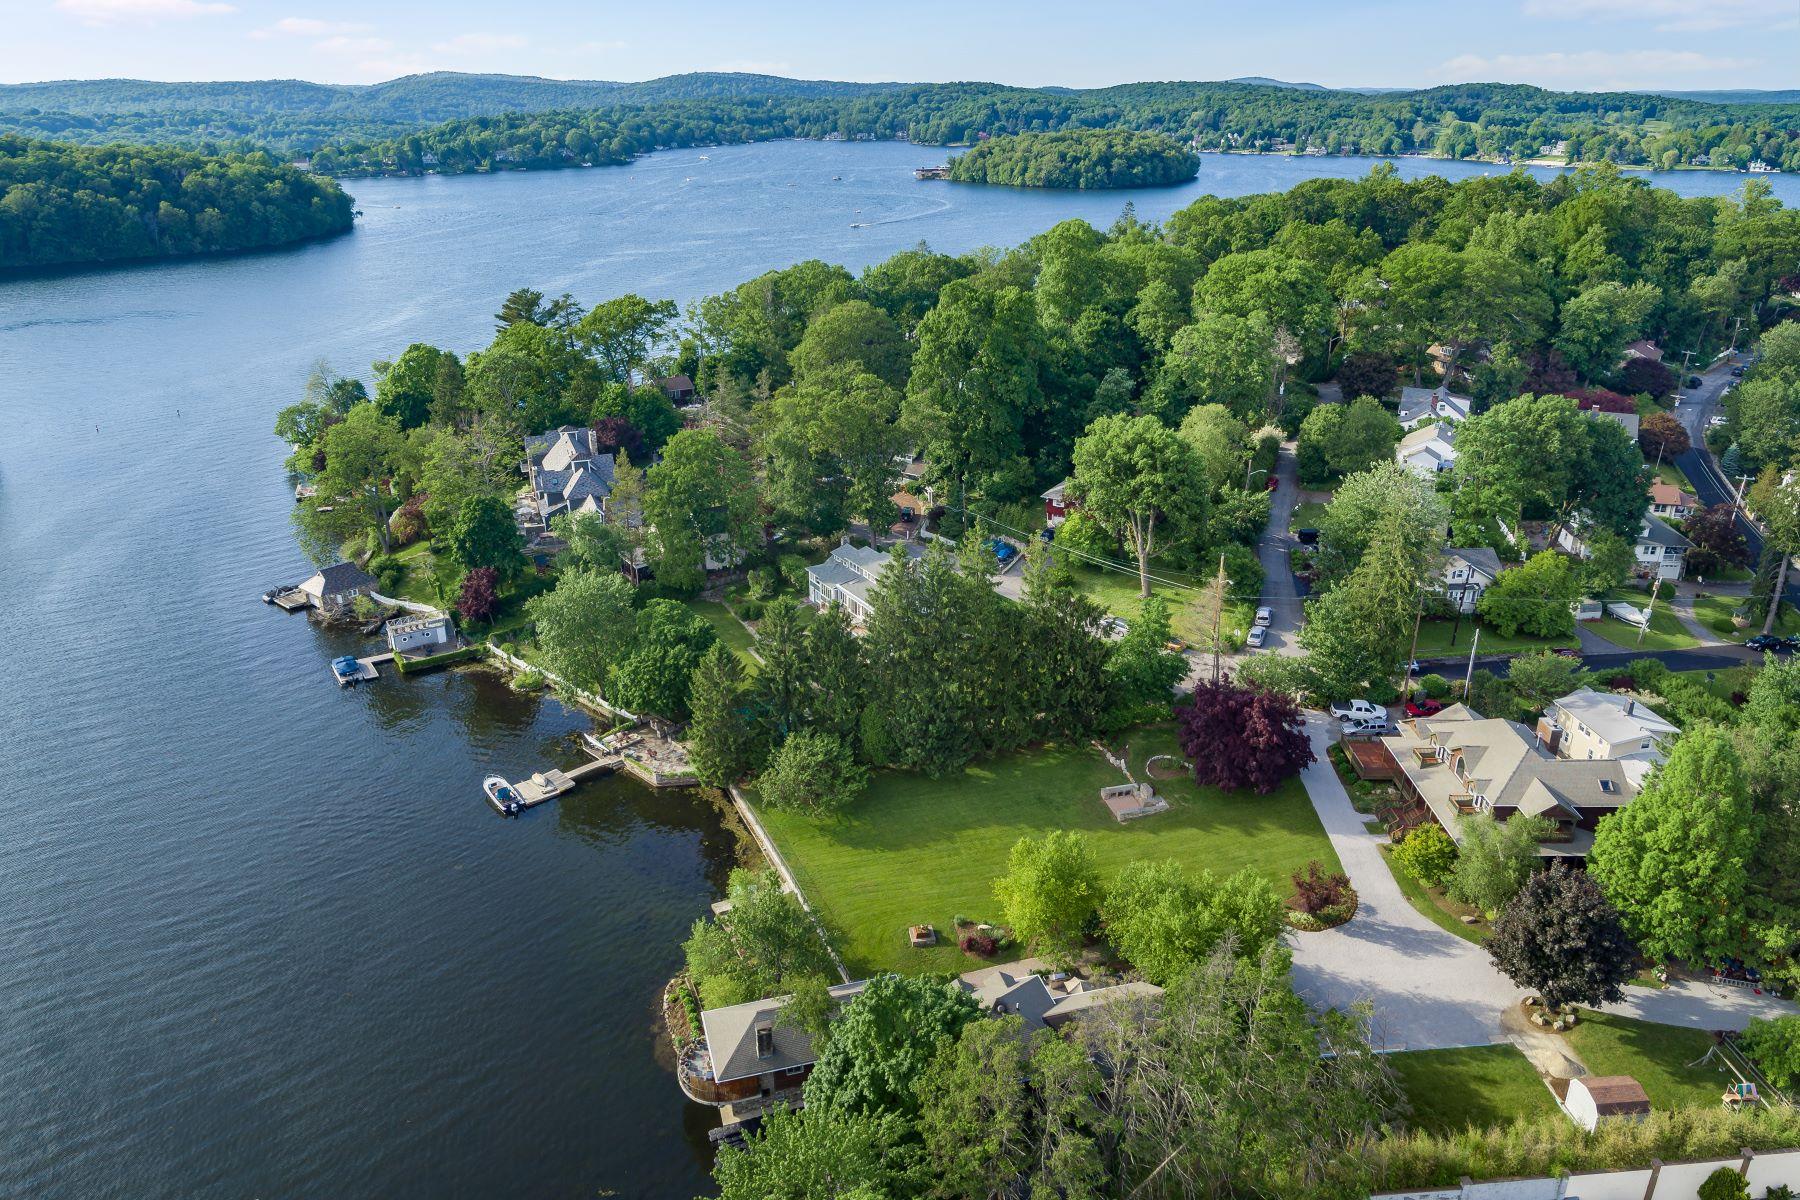 Single Family Homes для того Продажа на Spectacular Private Lakefront Estate 5 Tamarack Road Mahopac, Нью-Йорк 10541 Соединенные Штаты